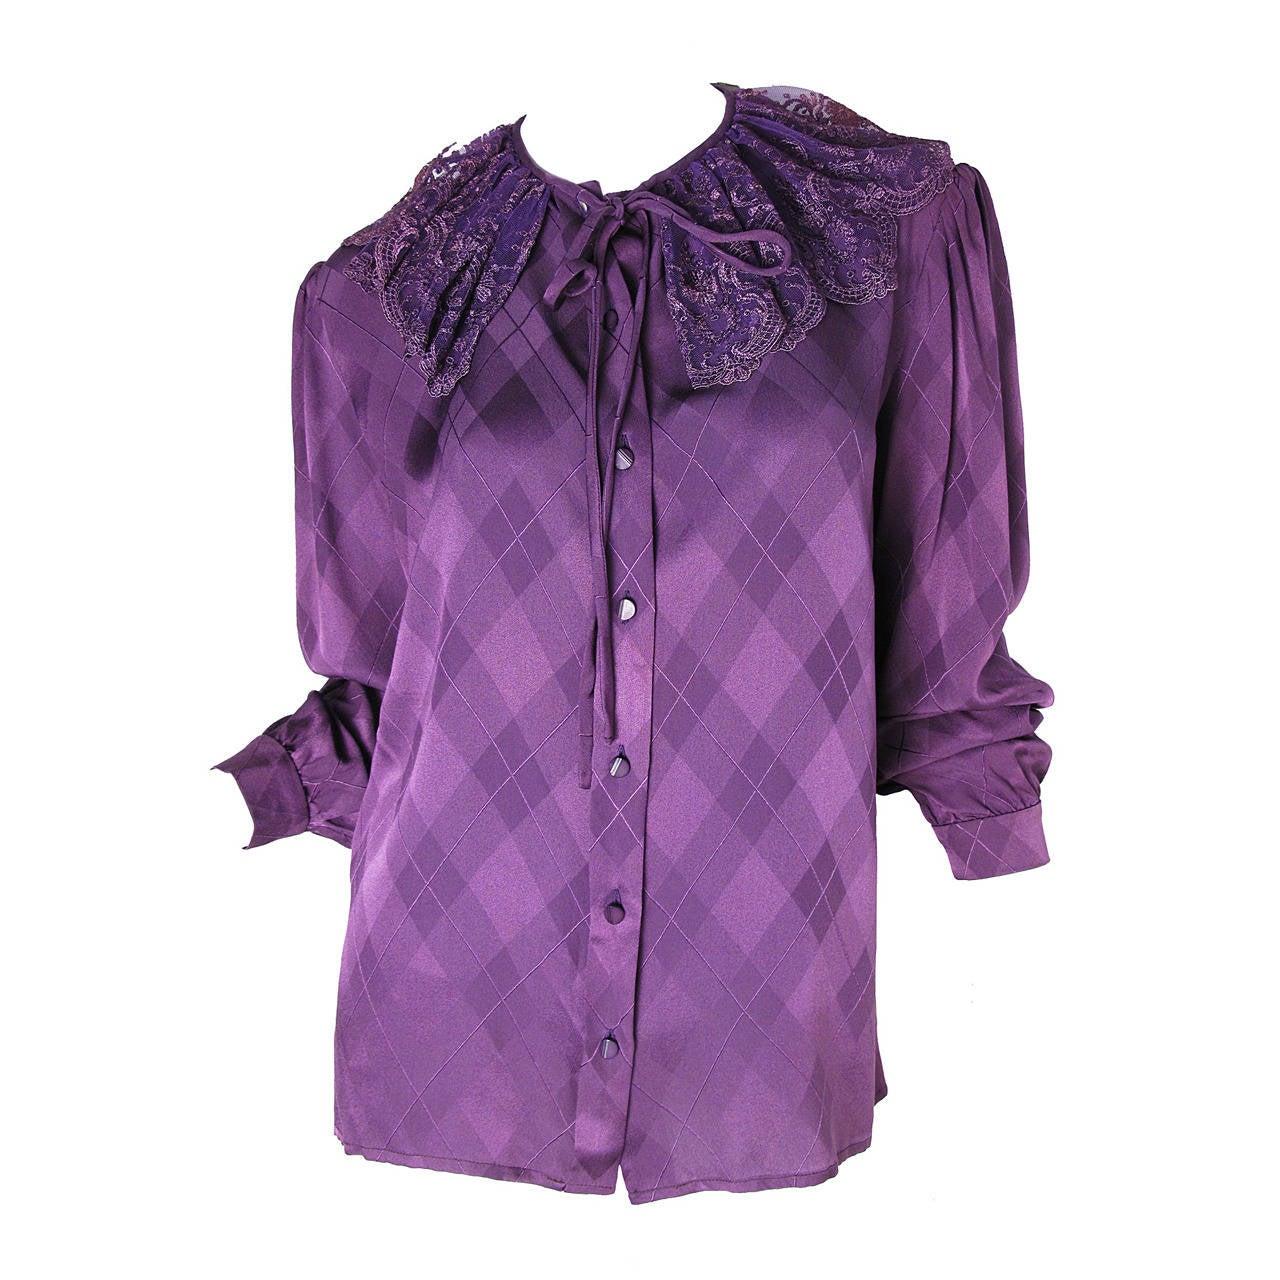 Valentino Purple Silk Blouse with Lace Collar 1